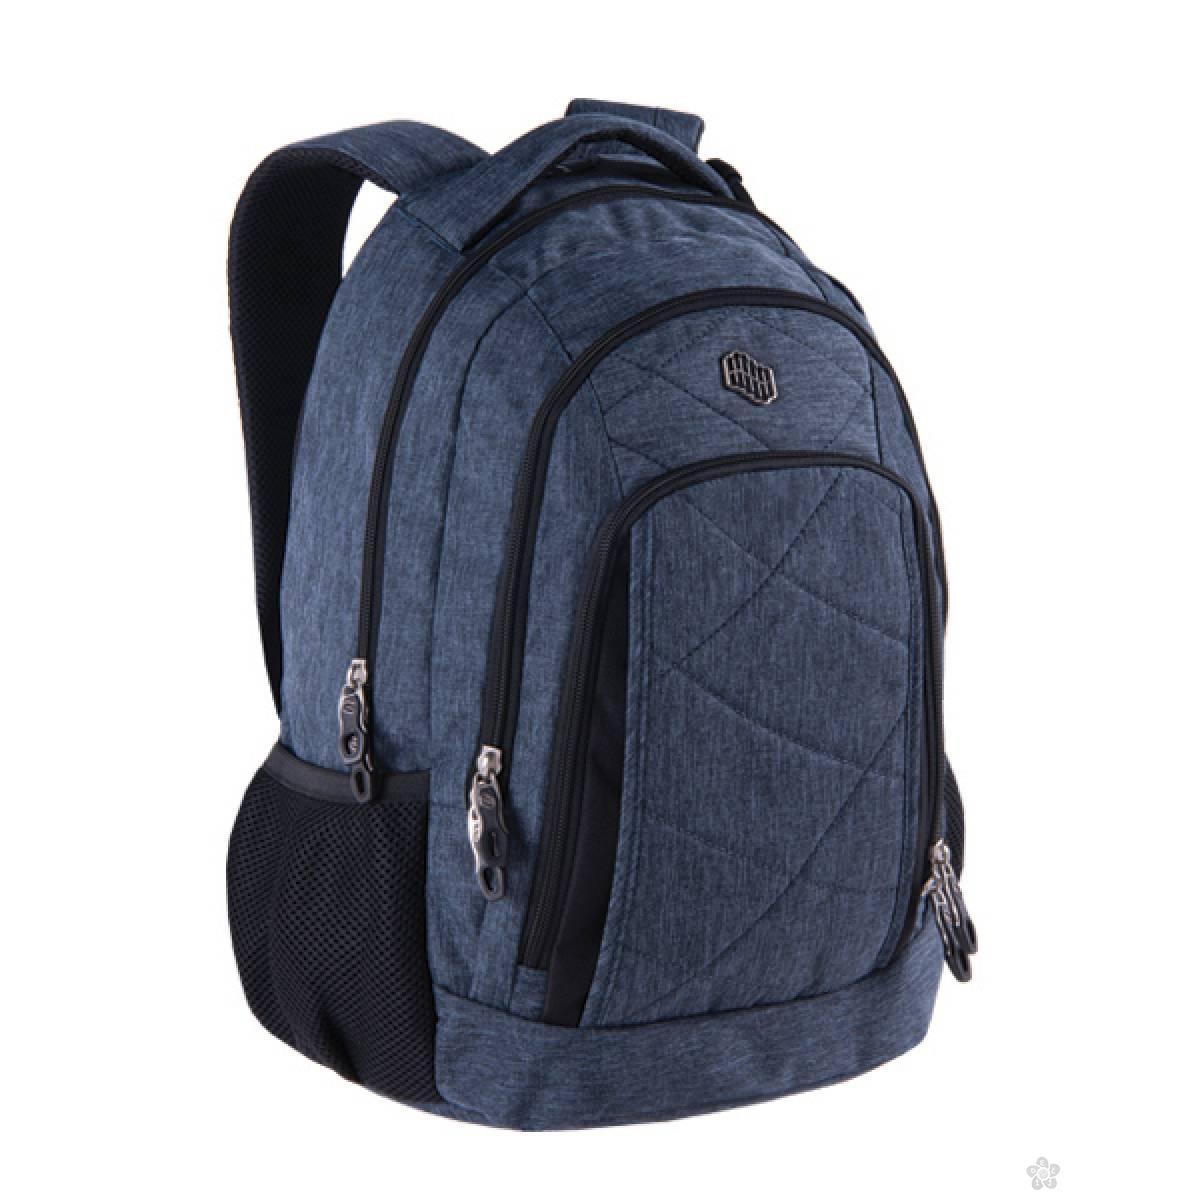 Ranac Classic Cationic Blue 121560